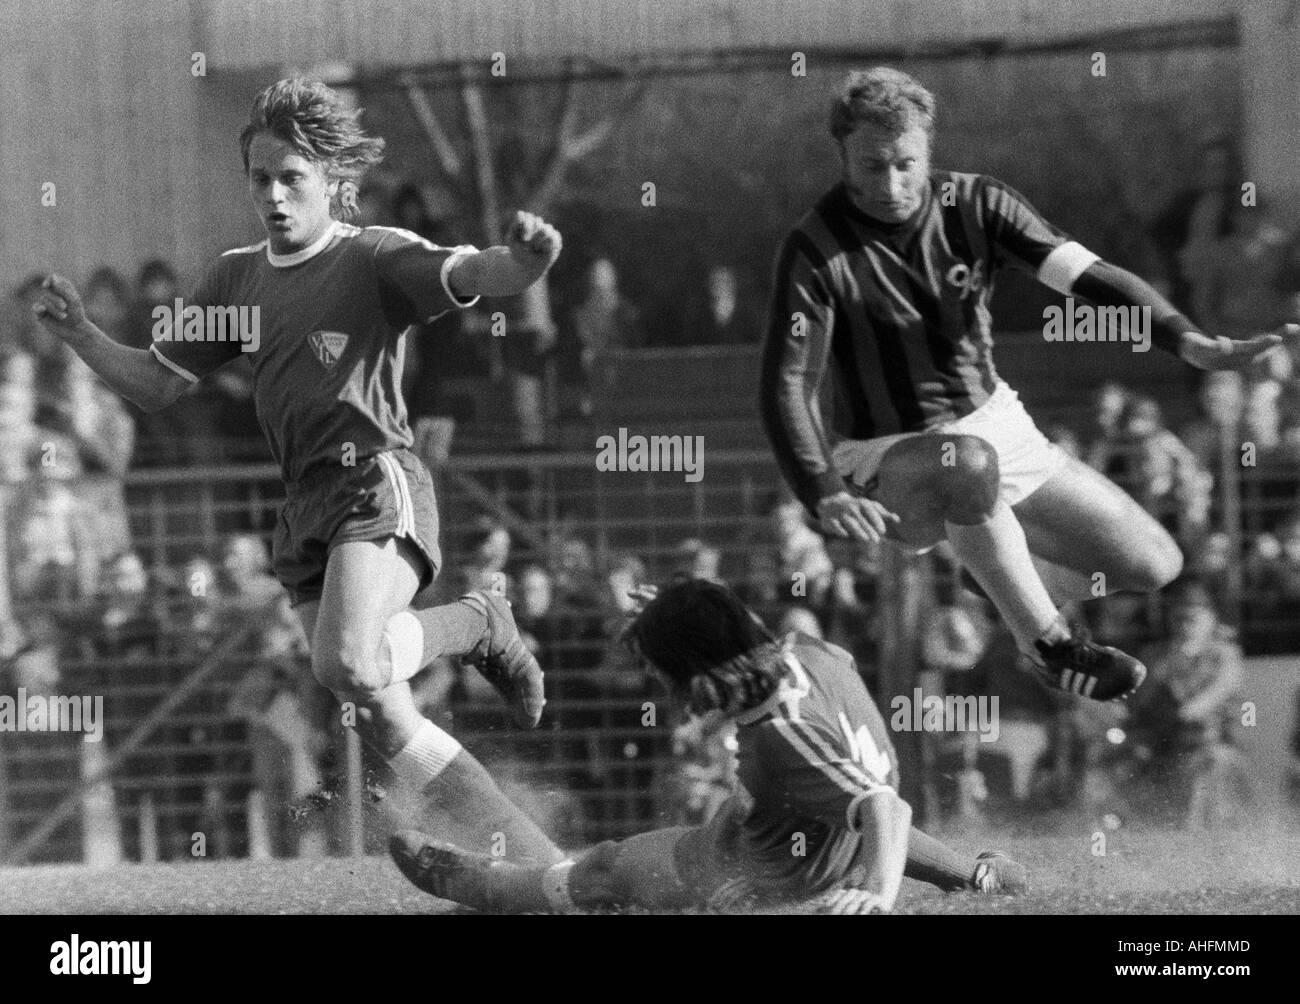 football, Bundesliga, 1971/1972, VfL Bochum versus Hanover 96 2:2, Stadium at the Castroper Strasse in Bochum, scene of the match, f.l.t.r. Hans Guenther Etterich (Bochum), a Bochum player aground, Hans Siemensmeyer (96) - Stock Image